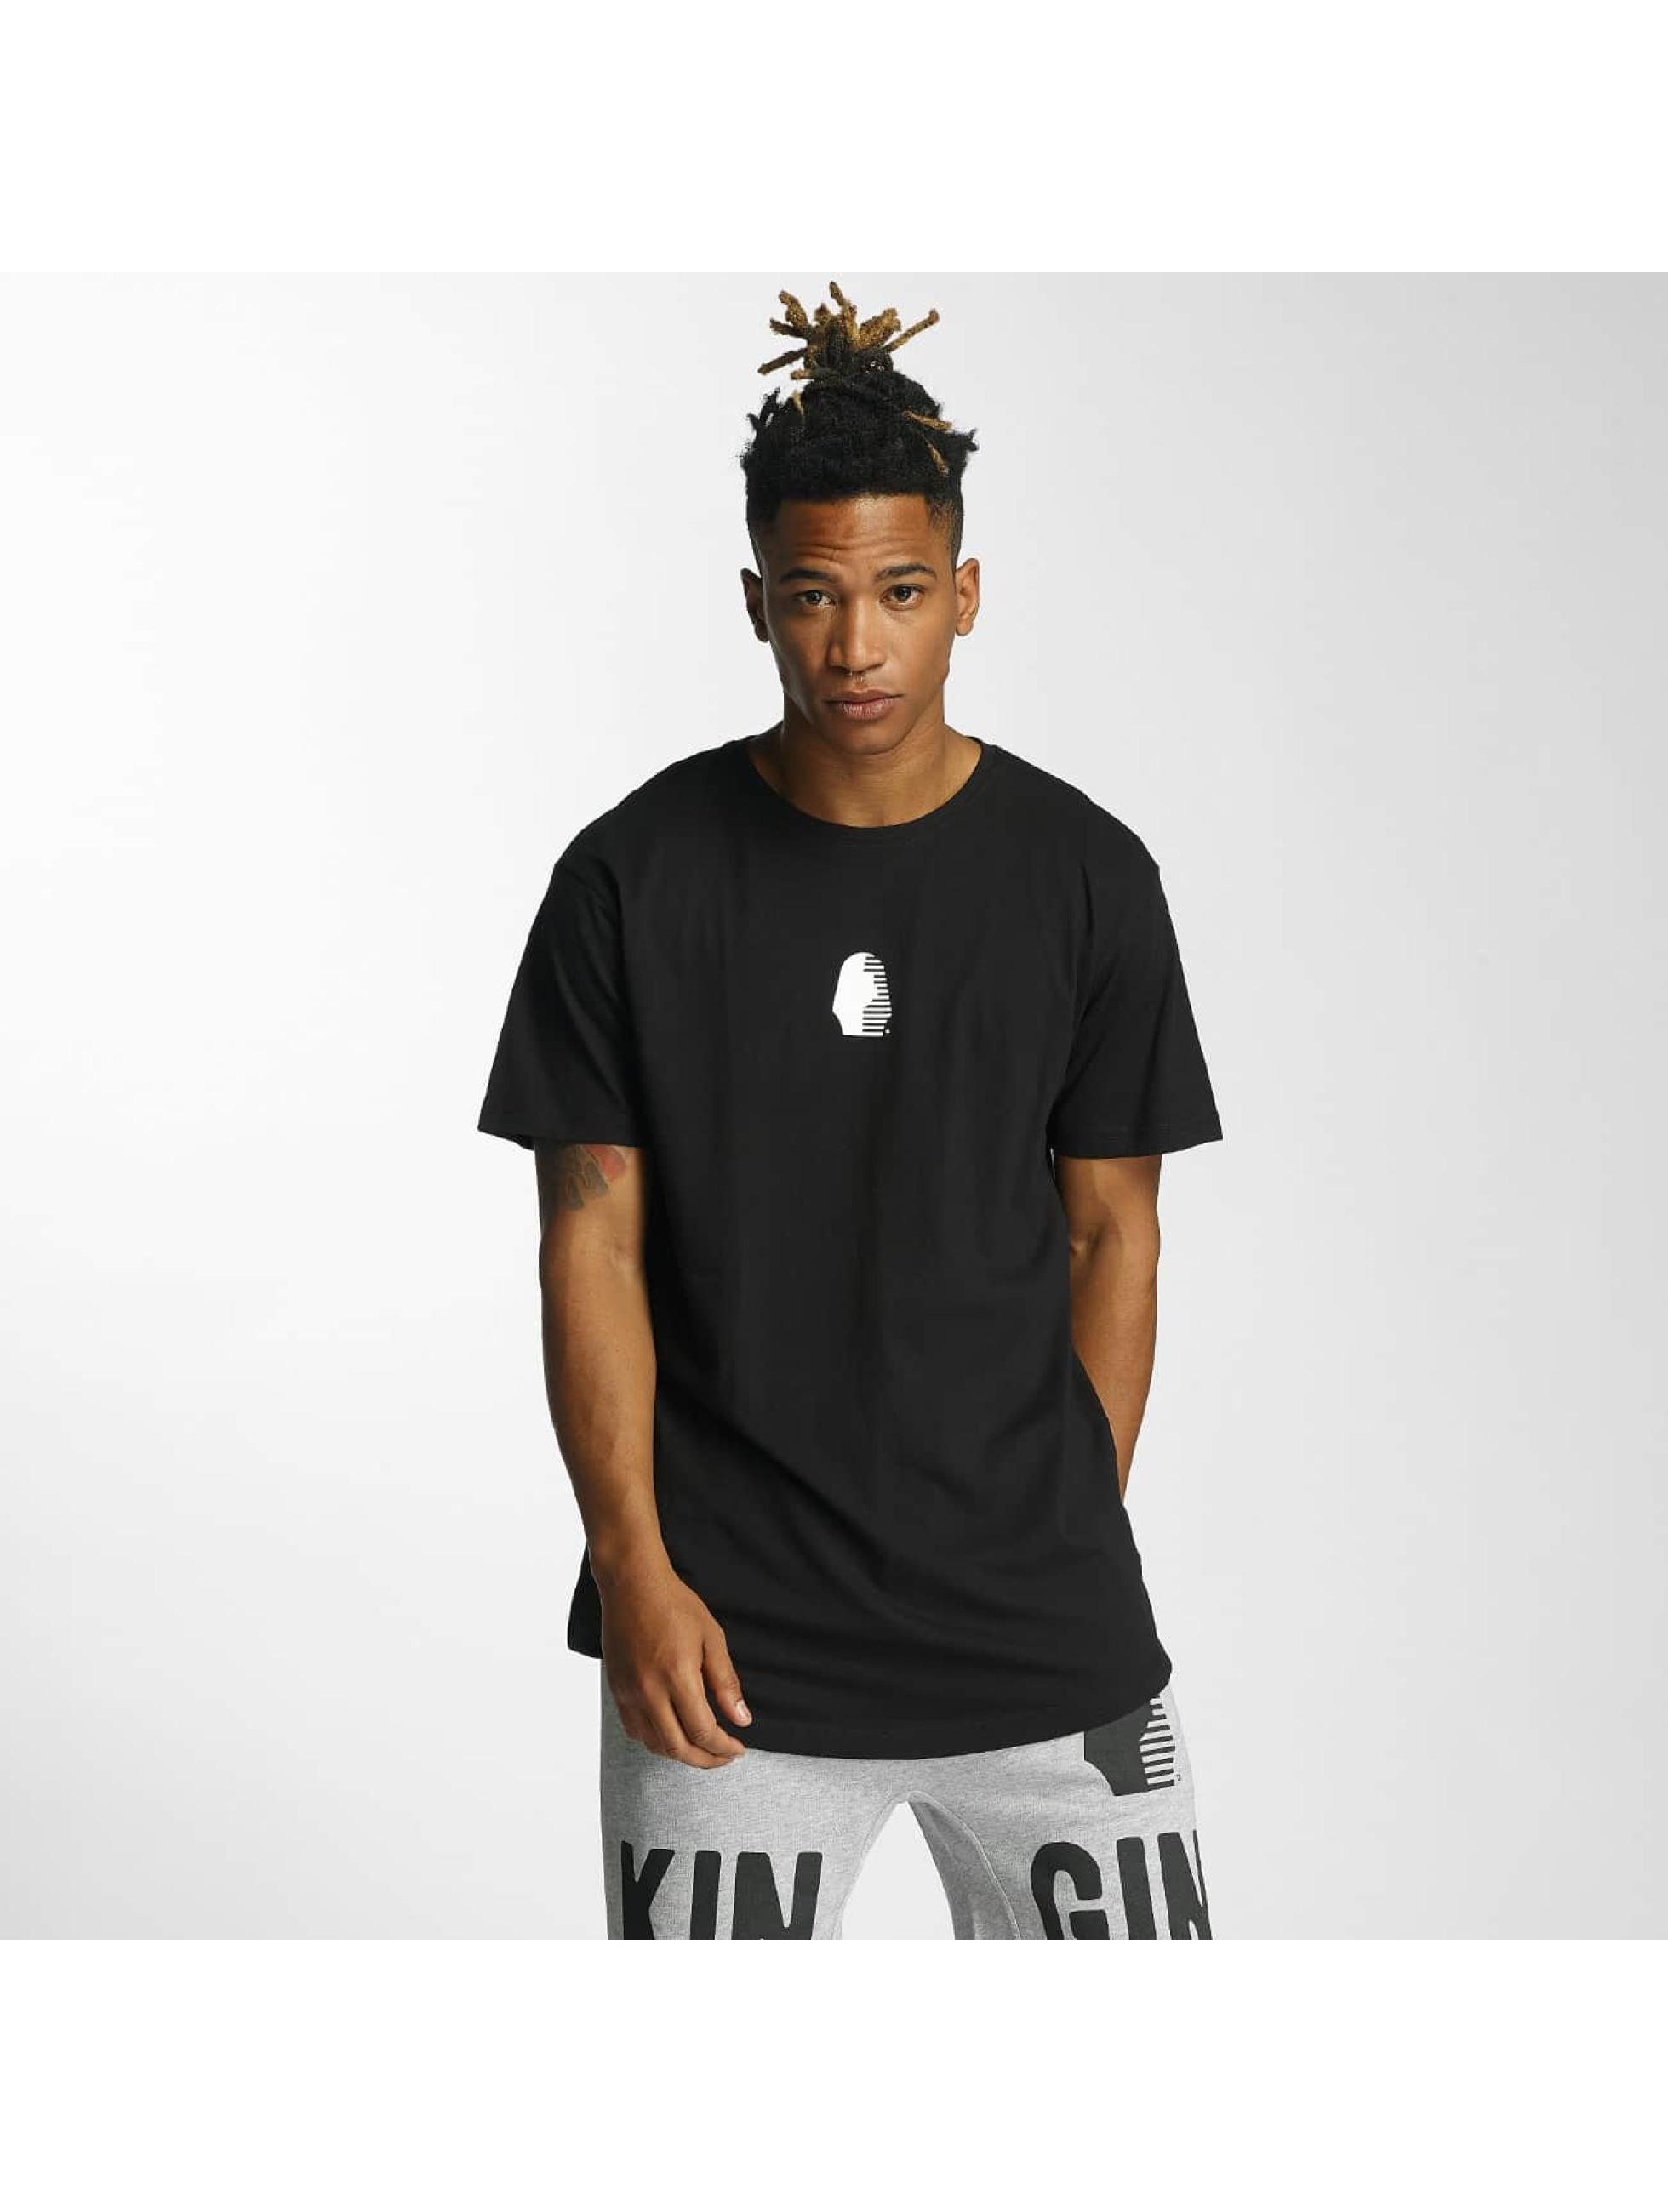 Kingin T-Shirt Comp. black